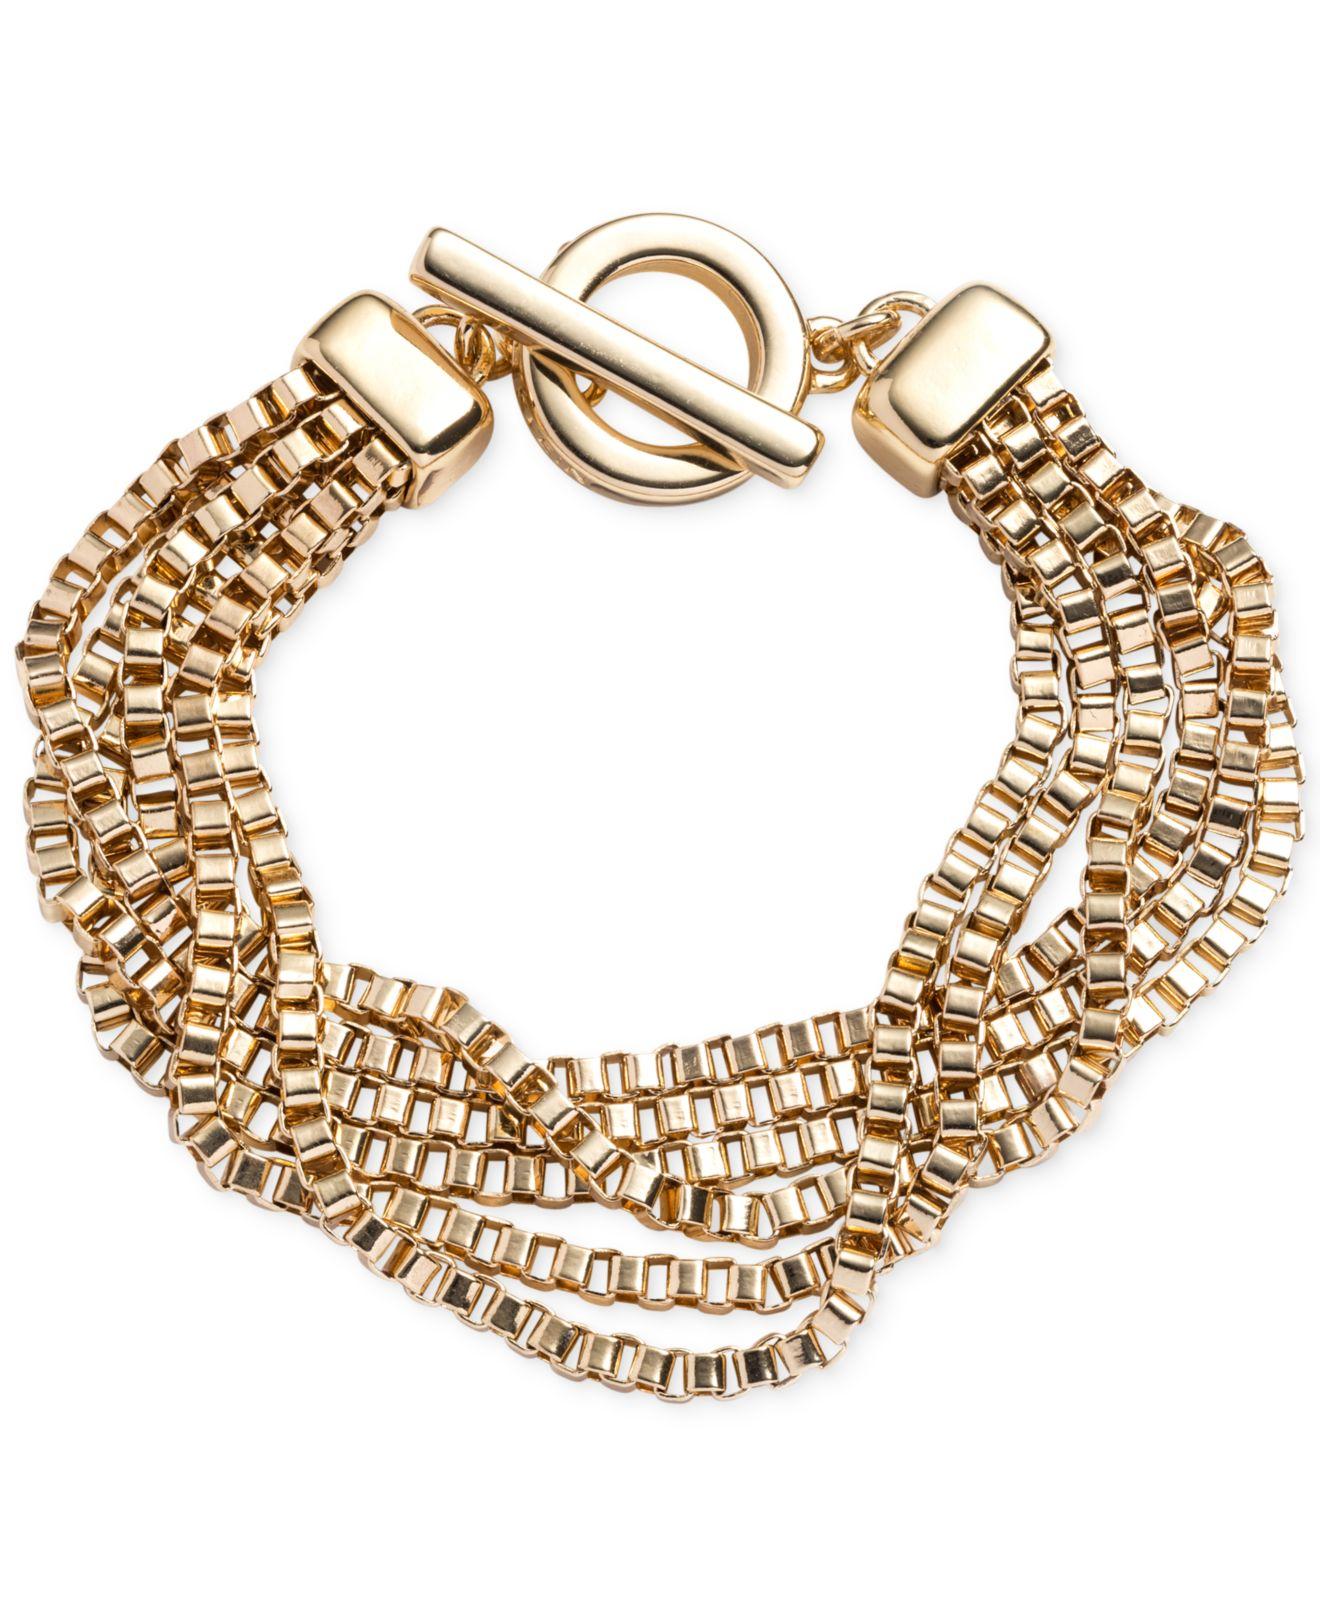 Anne klein gold tone multi row chain toggle bracelet in for Tj maxx jewelry box